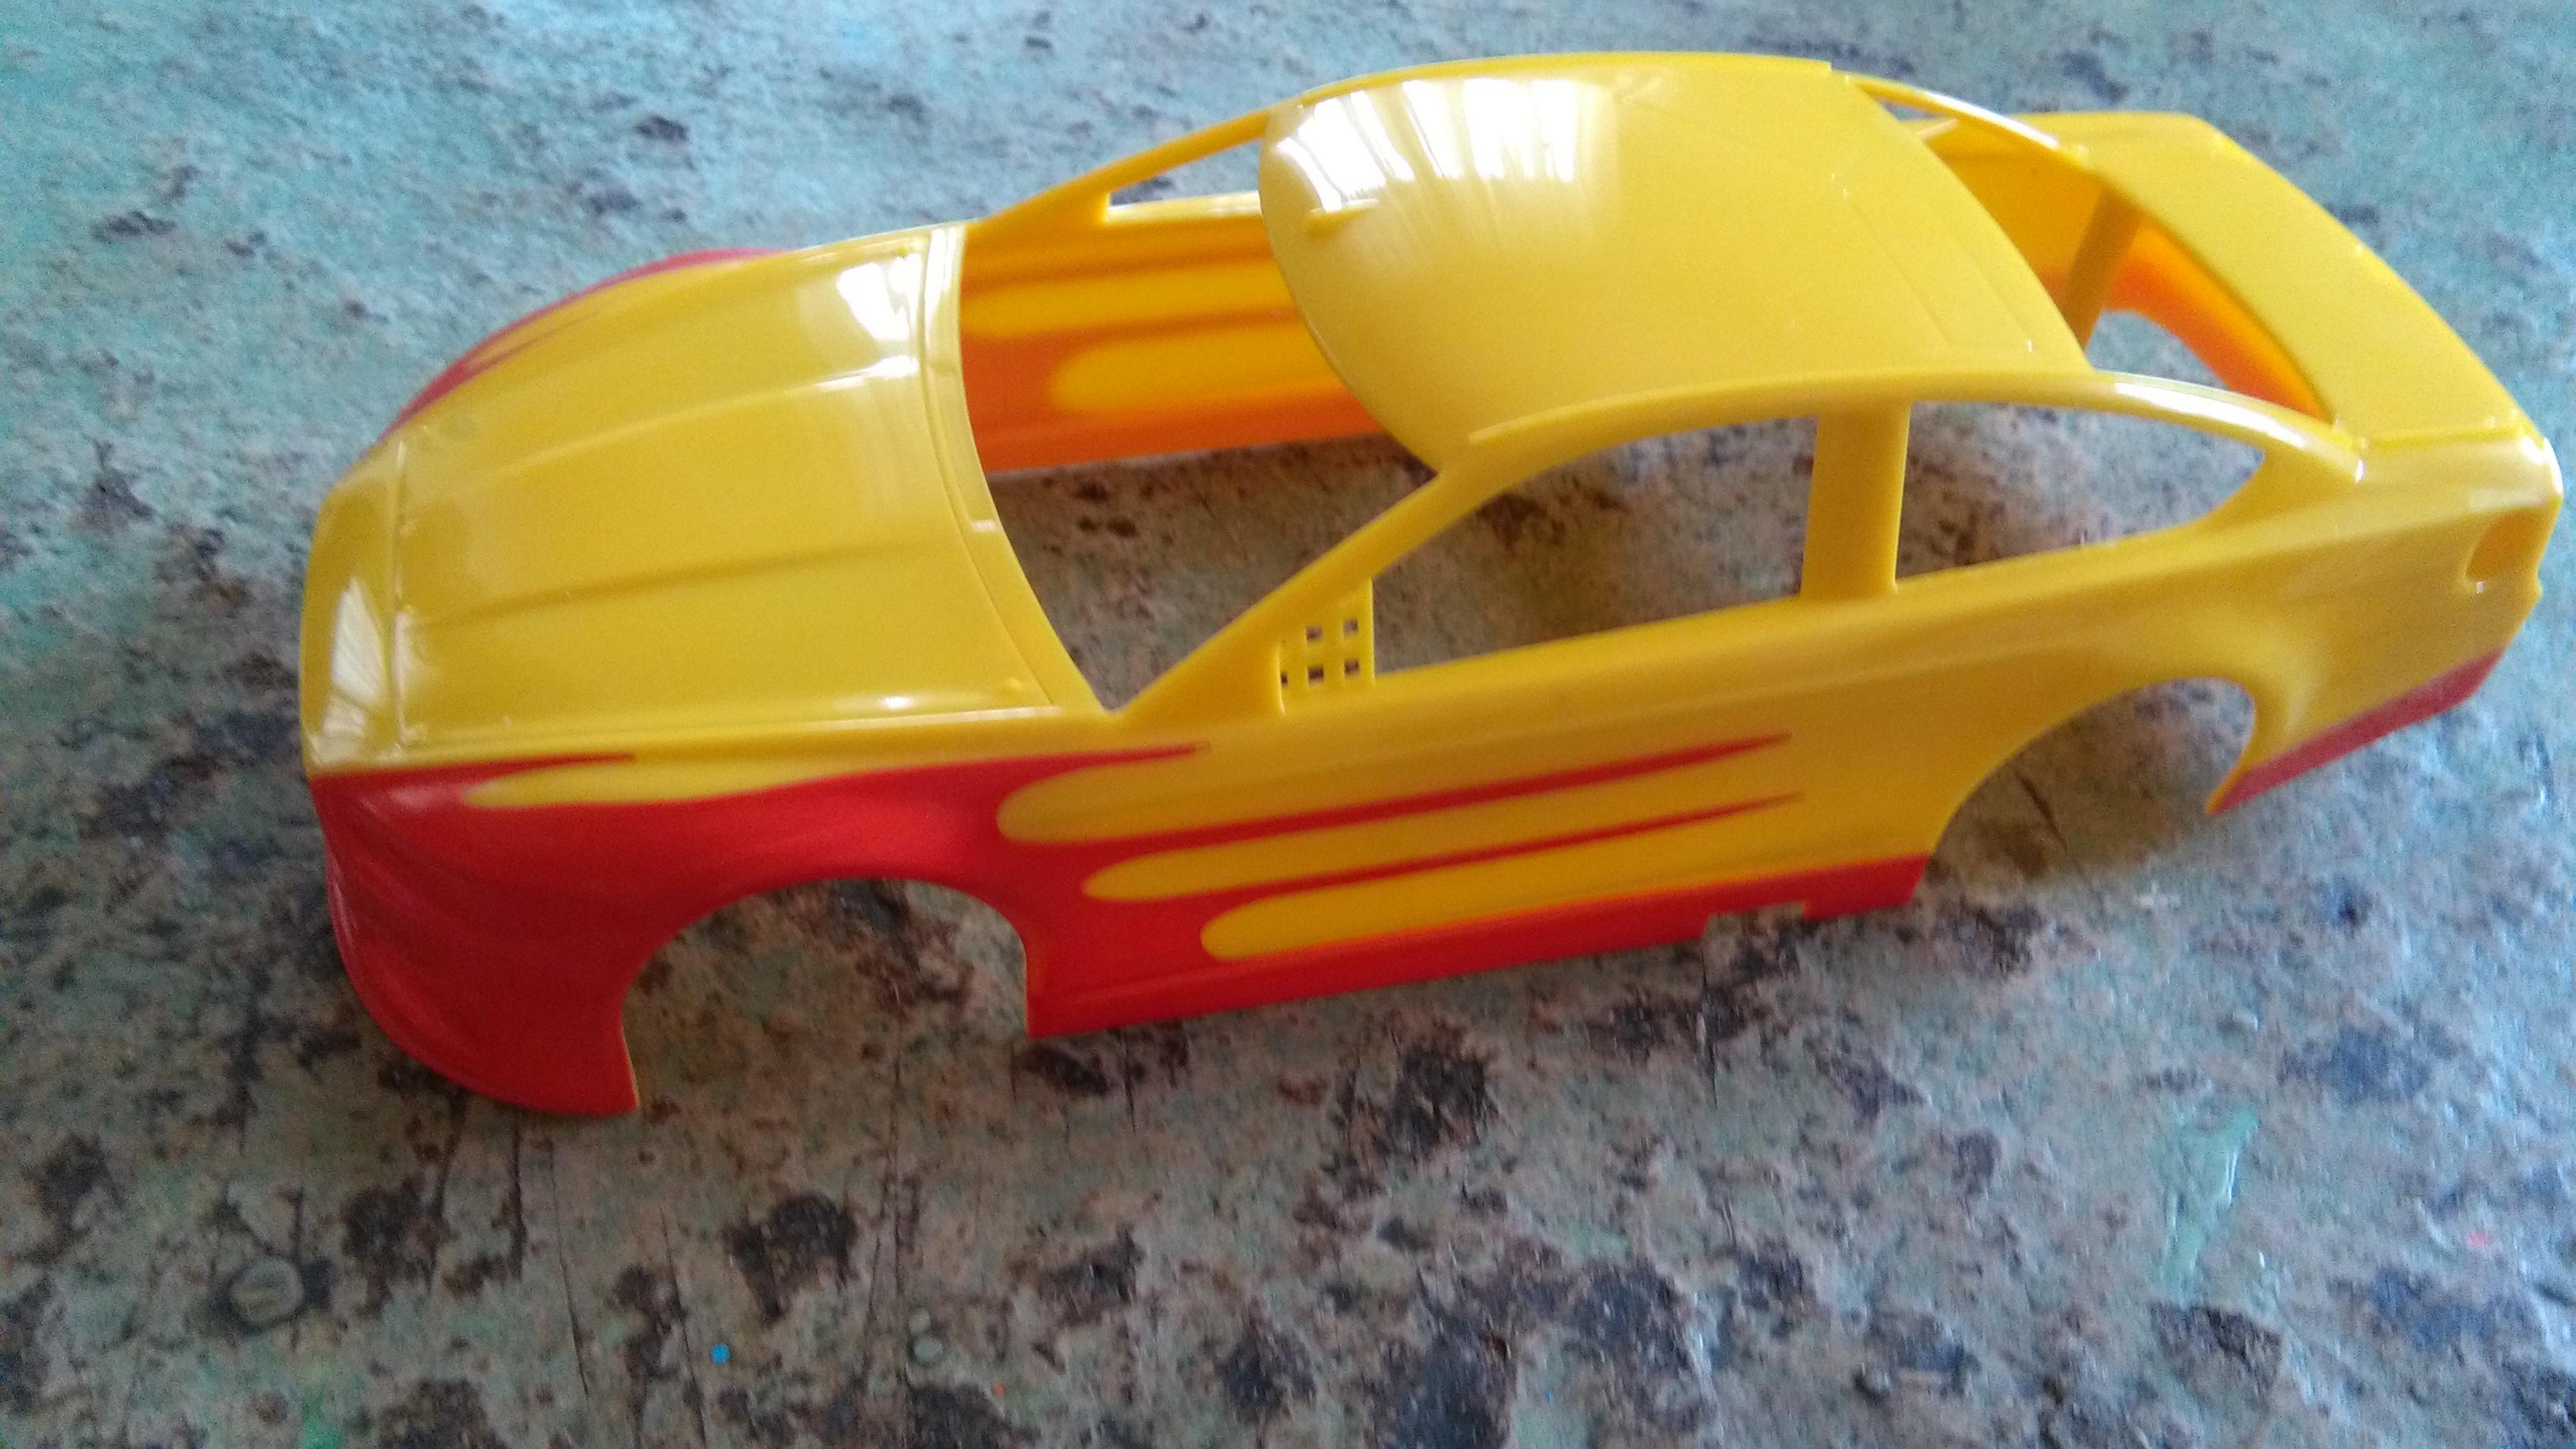 Ford Fusion Penskee 2014 #2 Brad K. Miller Lite - CHASE Version 457947IMG20160311154731